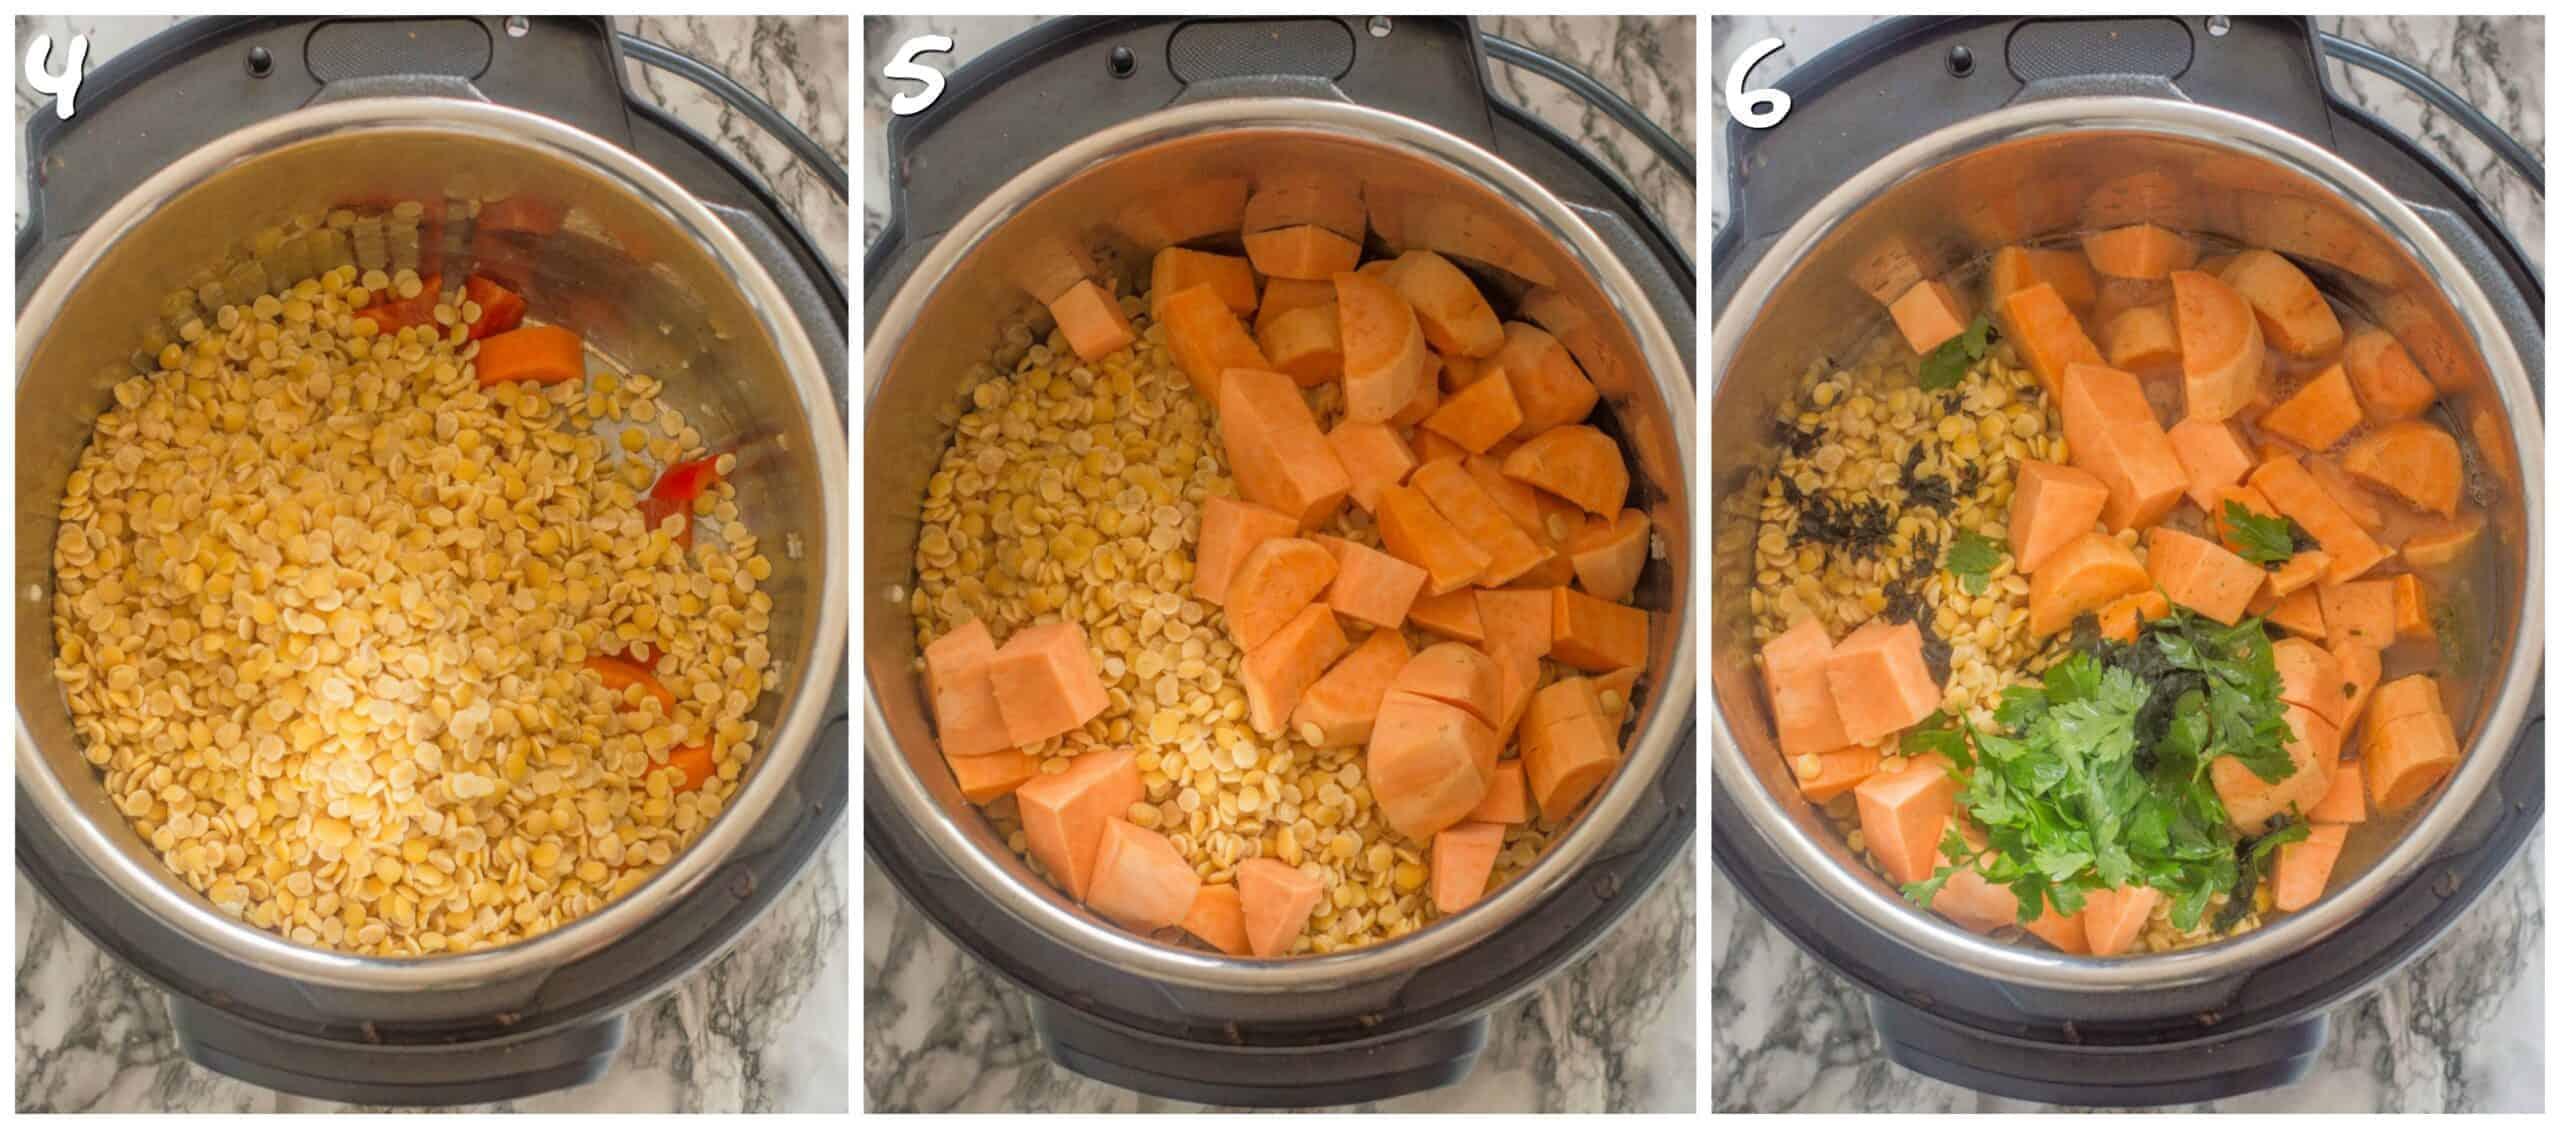 steps 4-6 adding split peas, sweet potatoes and herbs